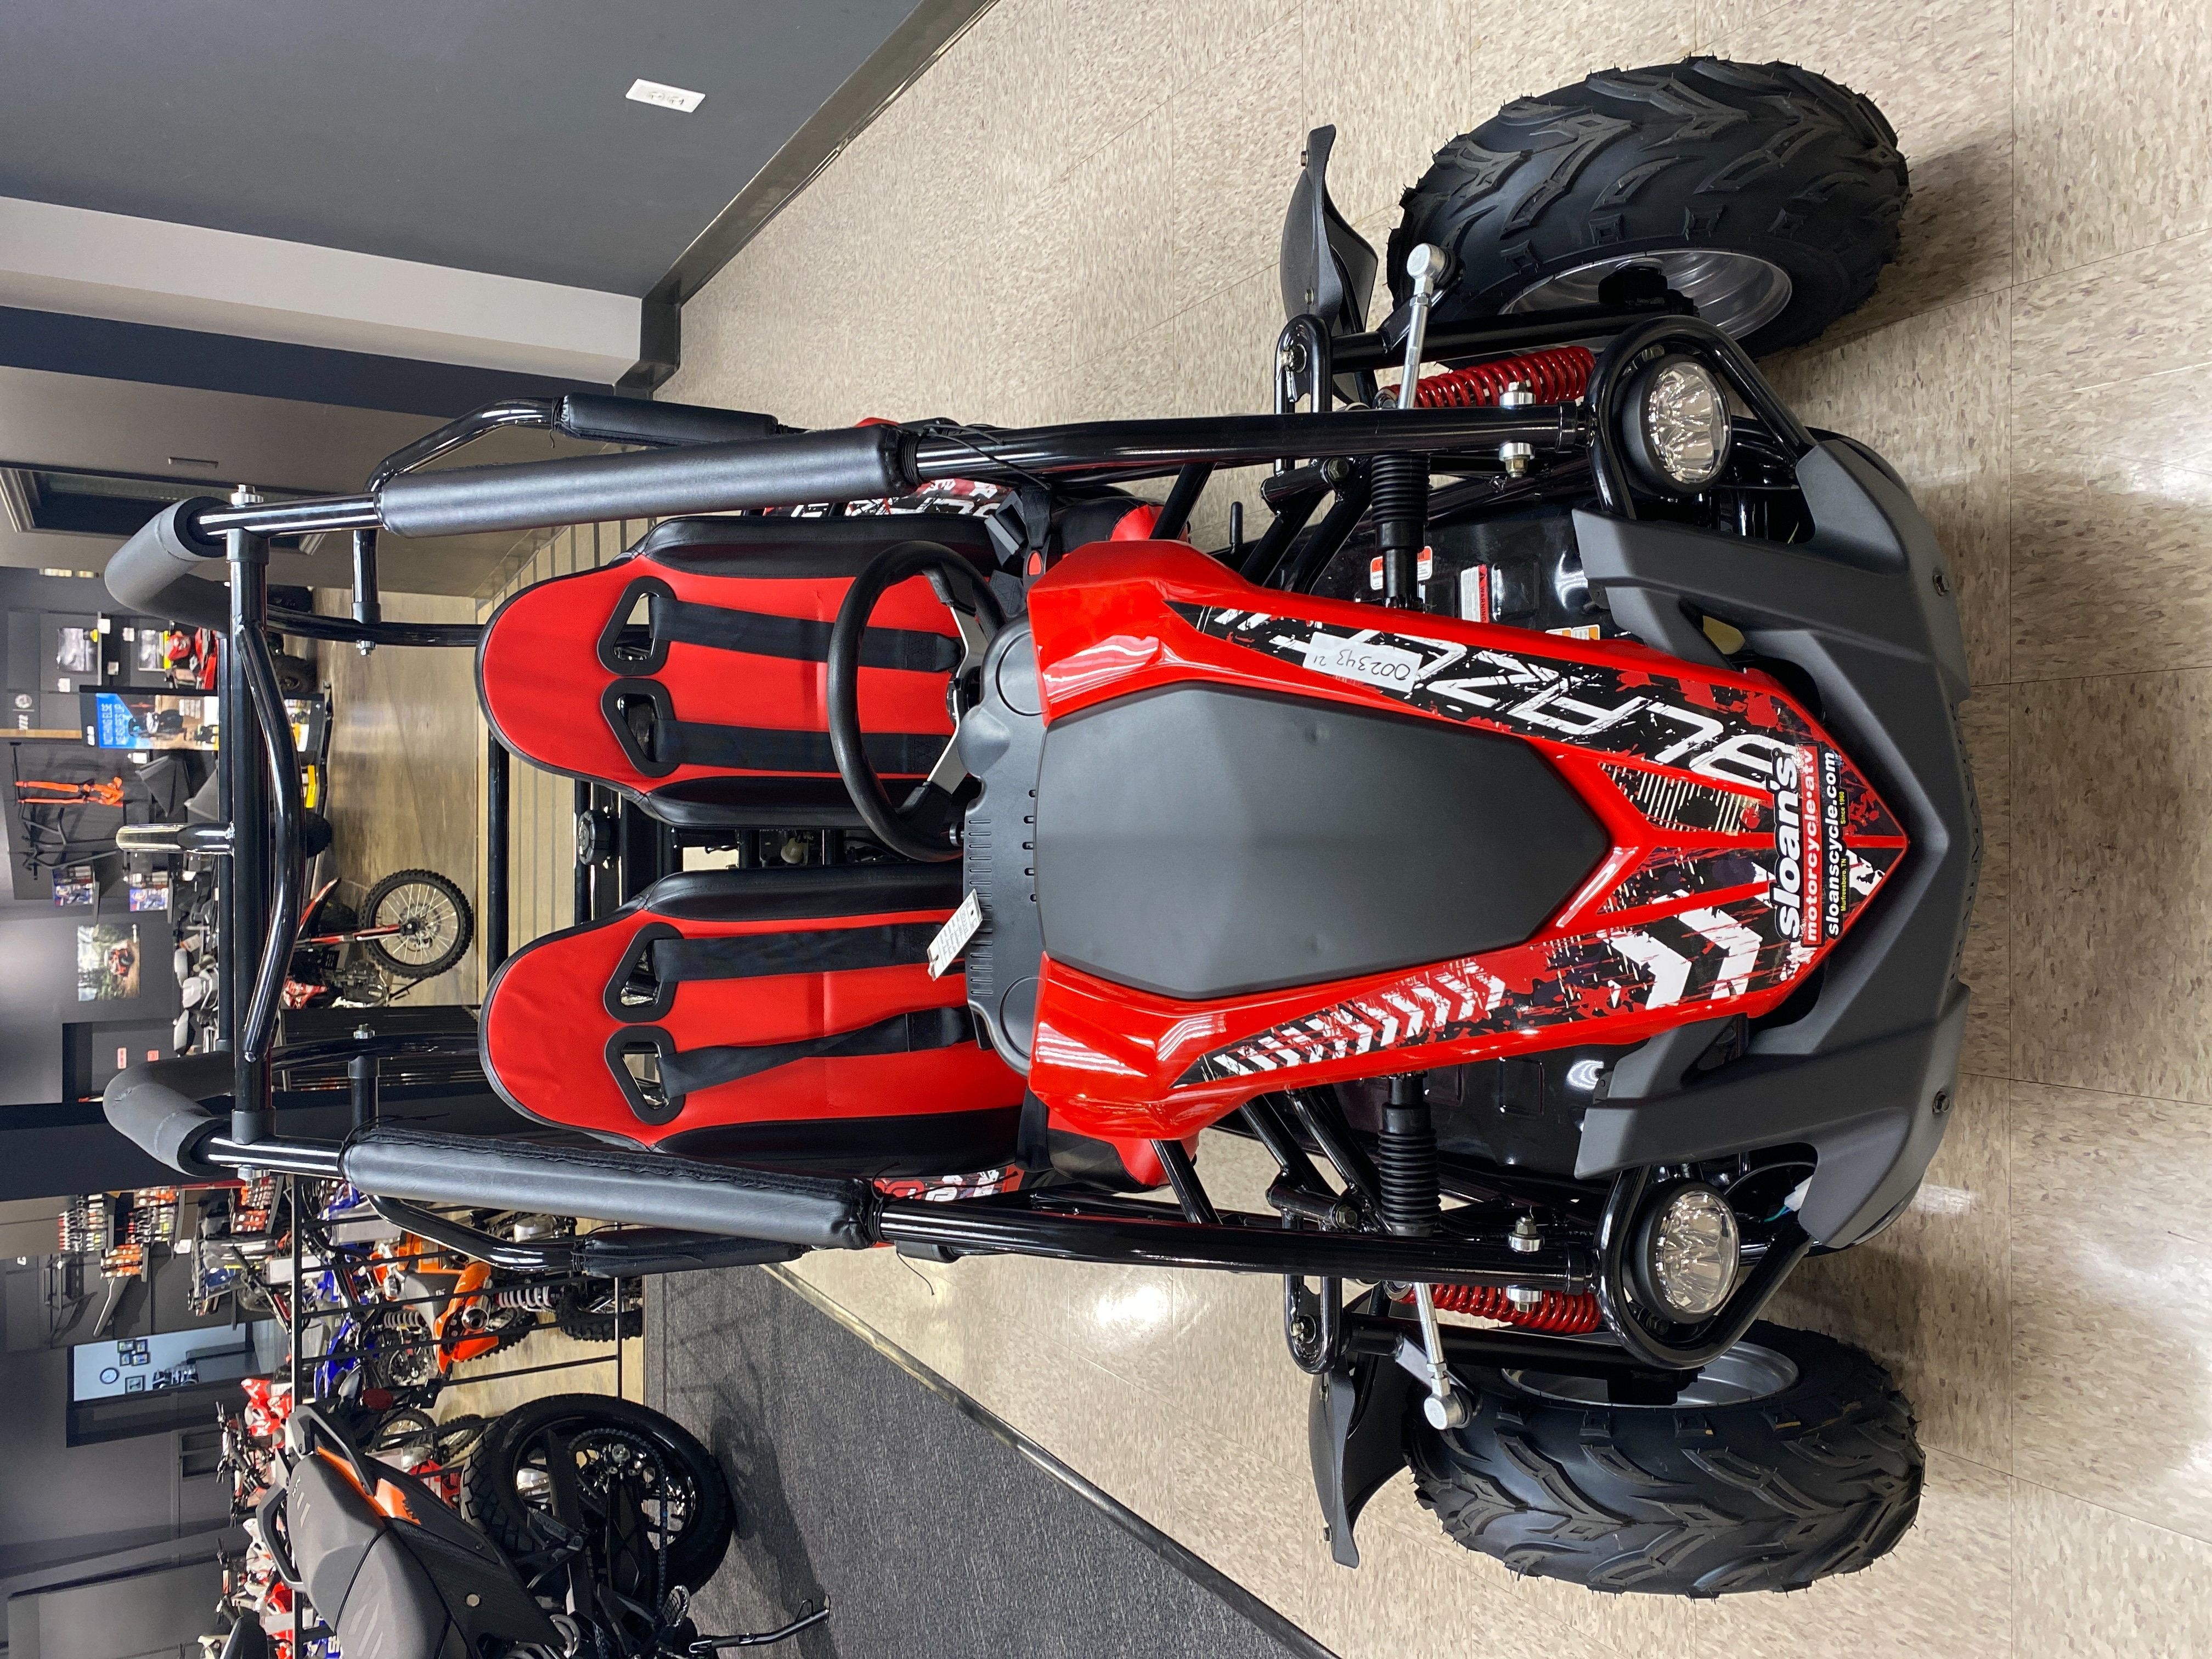 2021 Trail Master Karts BLAZER 200R-A-RED BLAZER 200R-A-RED at Sloans Motorcycle ATV, Murfreesboro, TN, 37129